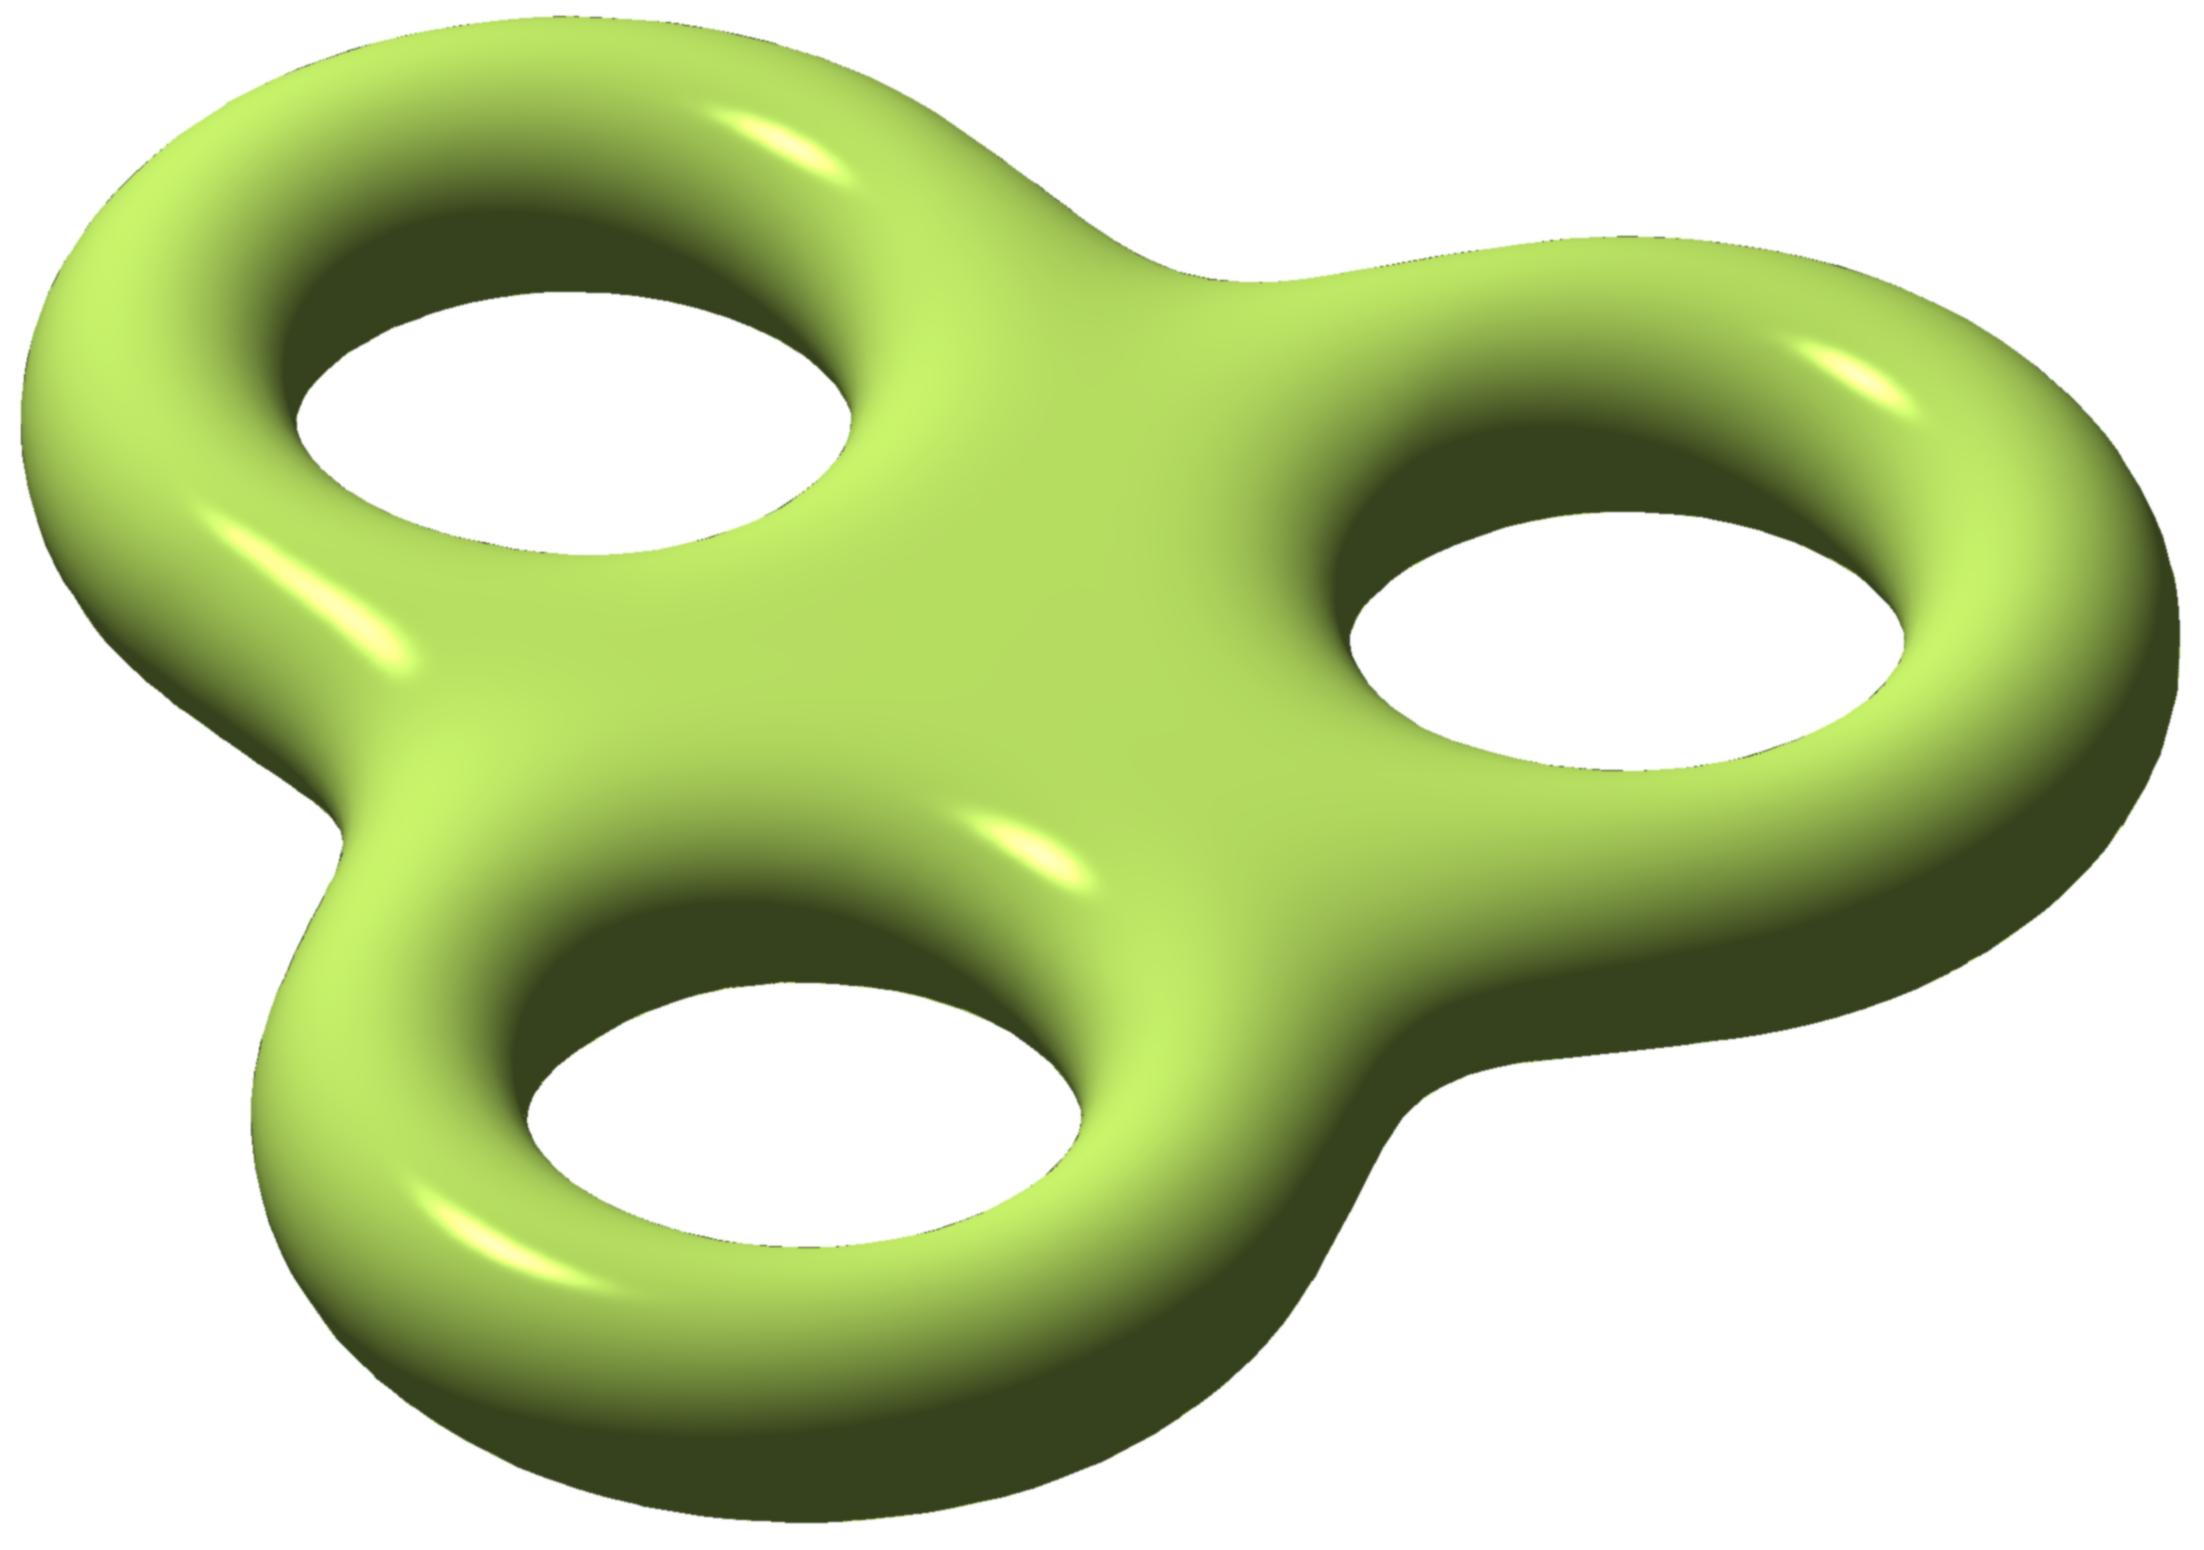 A genus 3 handlebody